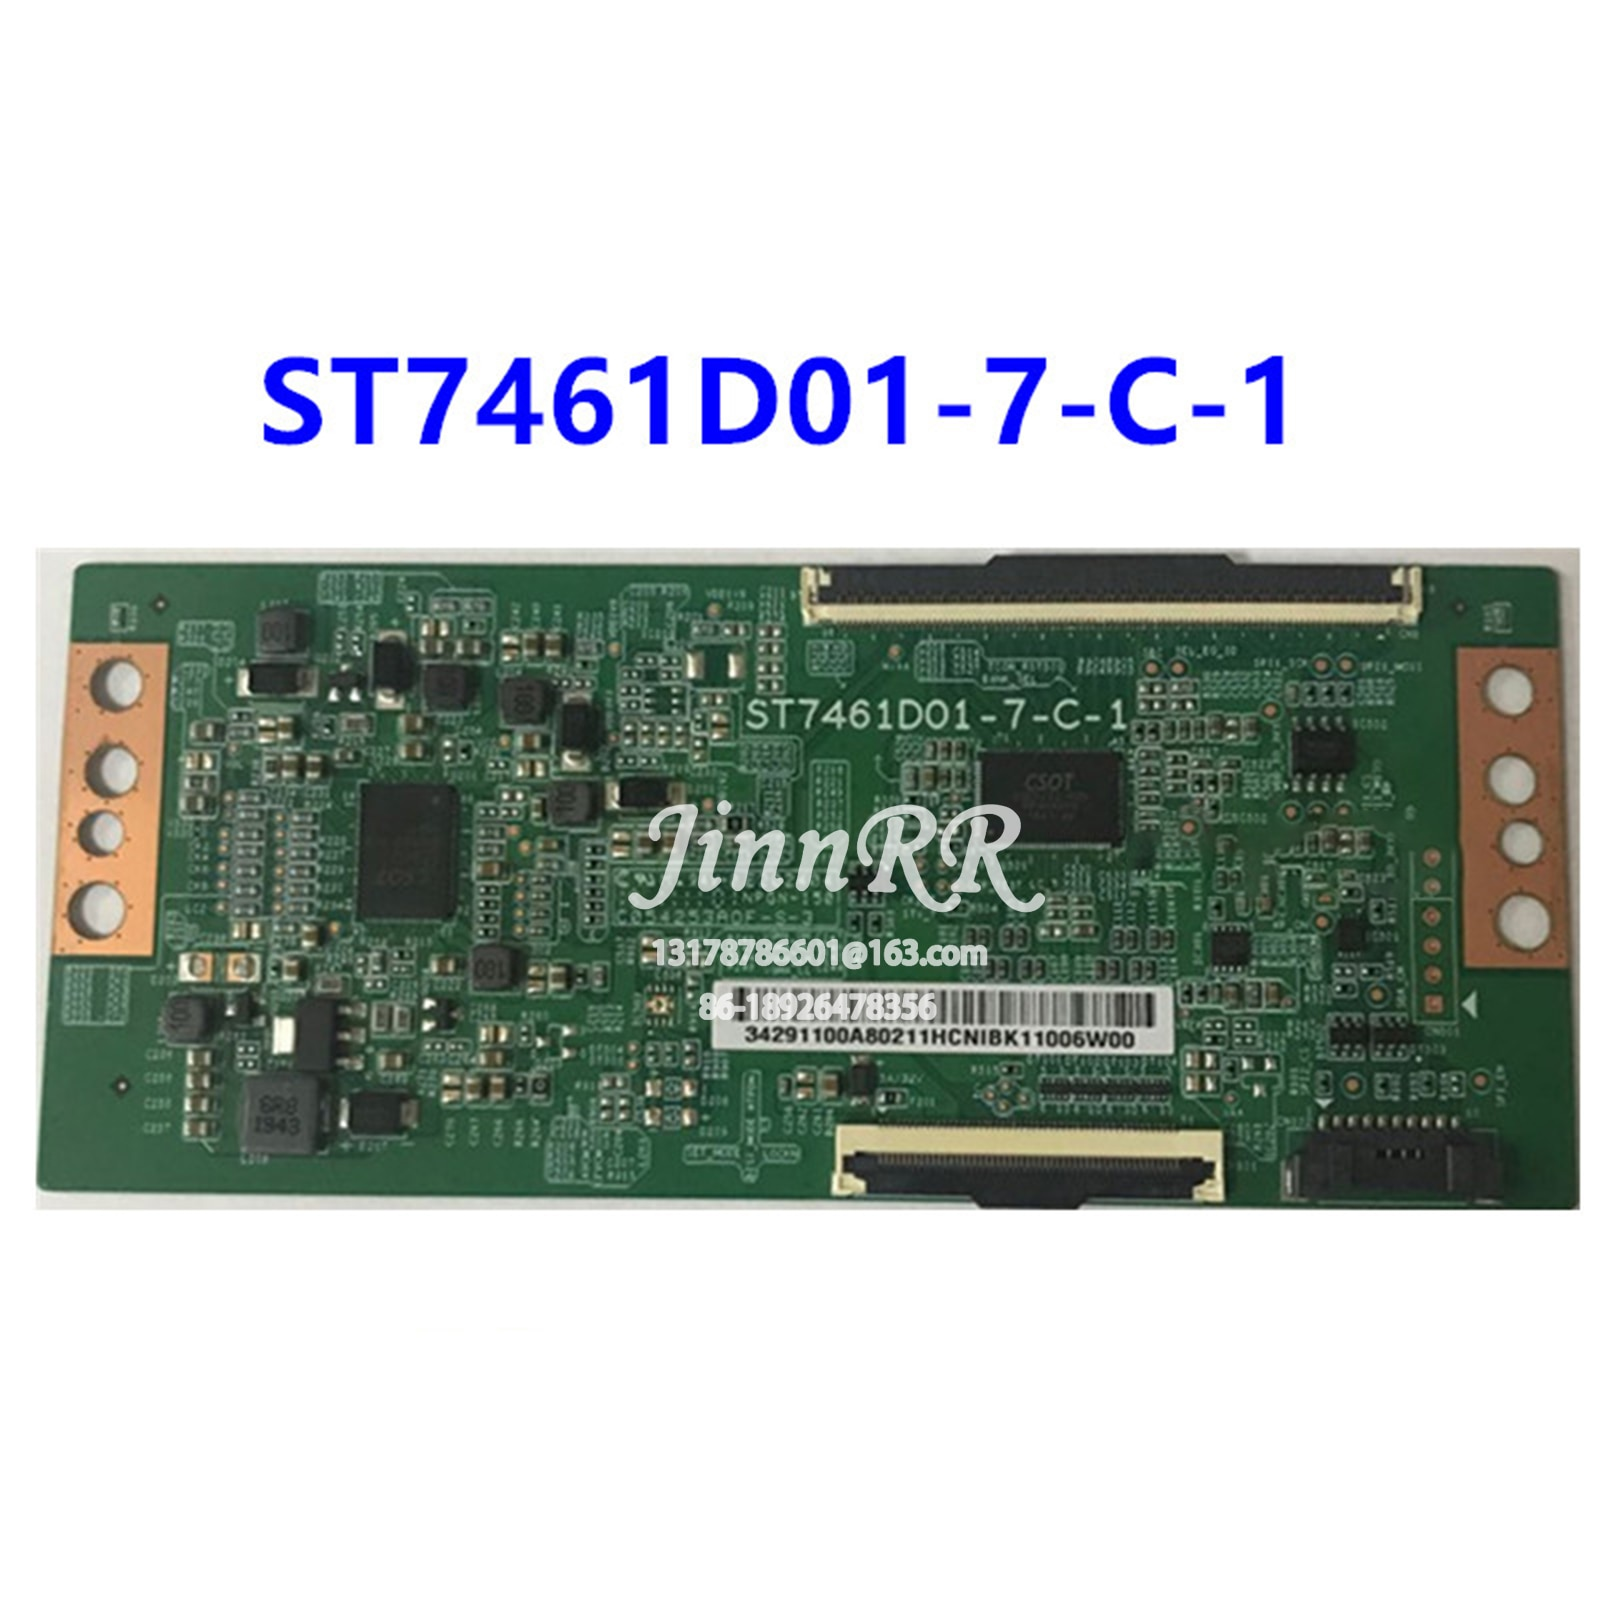 ST7461D01-7-C-1 الأصلي اللاسلكية ل 4K 60HZ المنطق مجلس اختبار صارم ضمان جودة ST7461D01-7-C-1